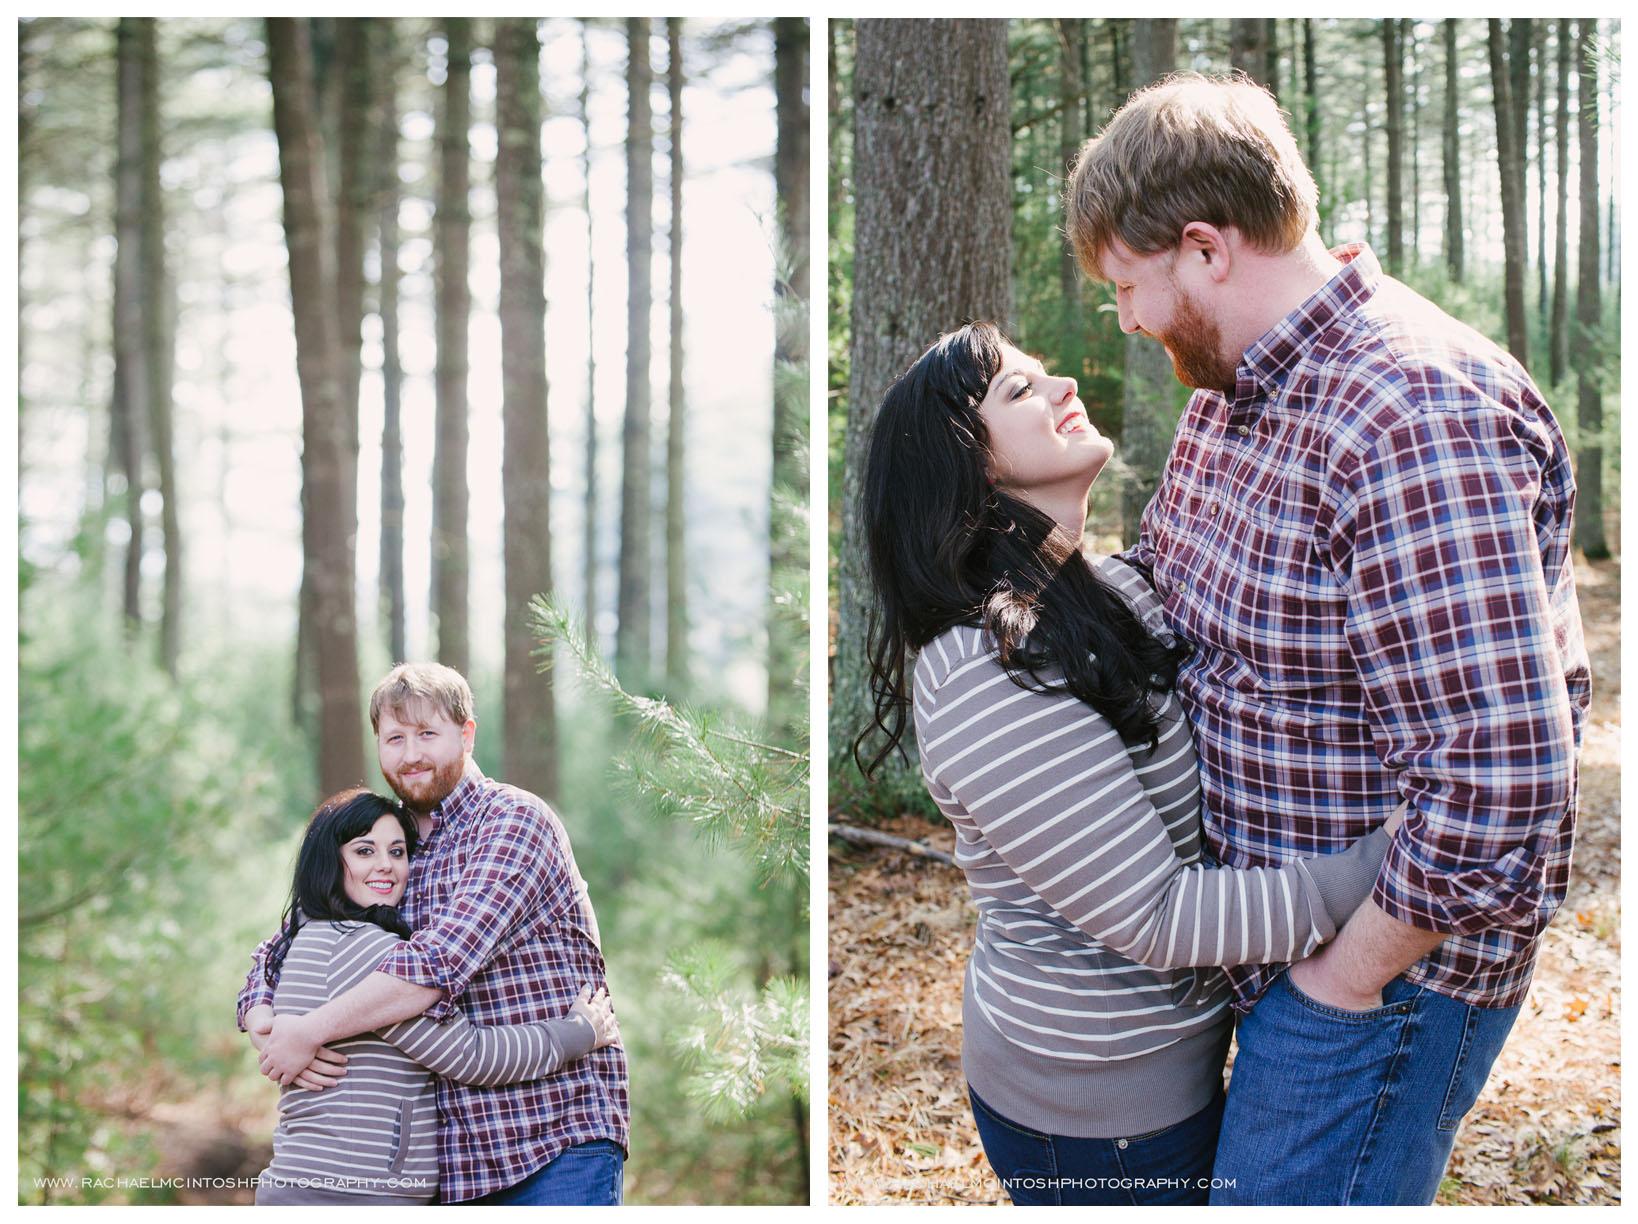 Spring Engagement Session-Asheville Wedding Photographer 13.jpeg